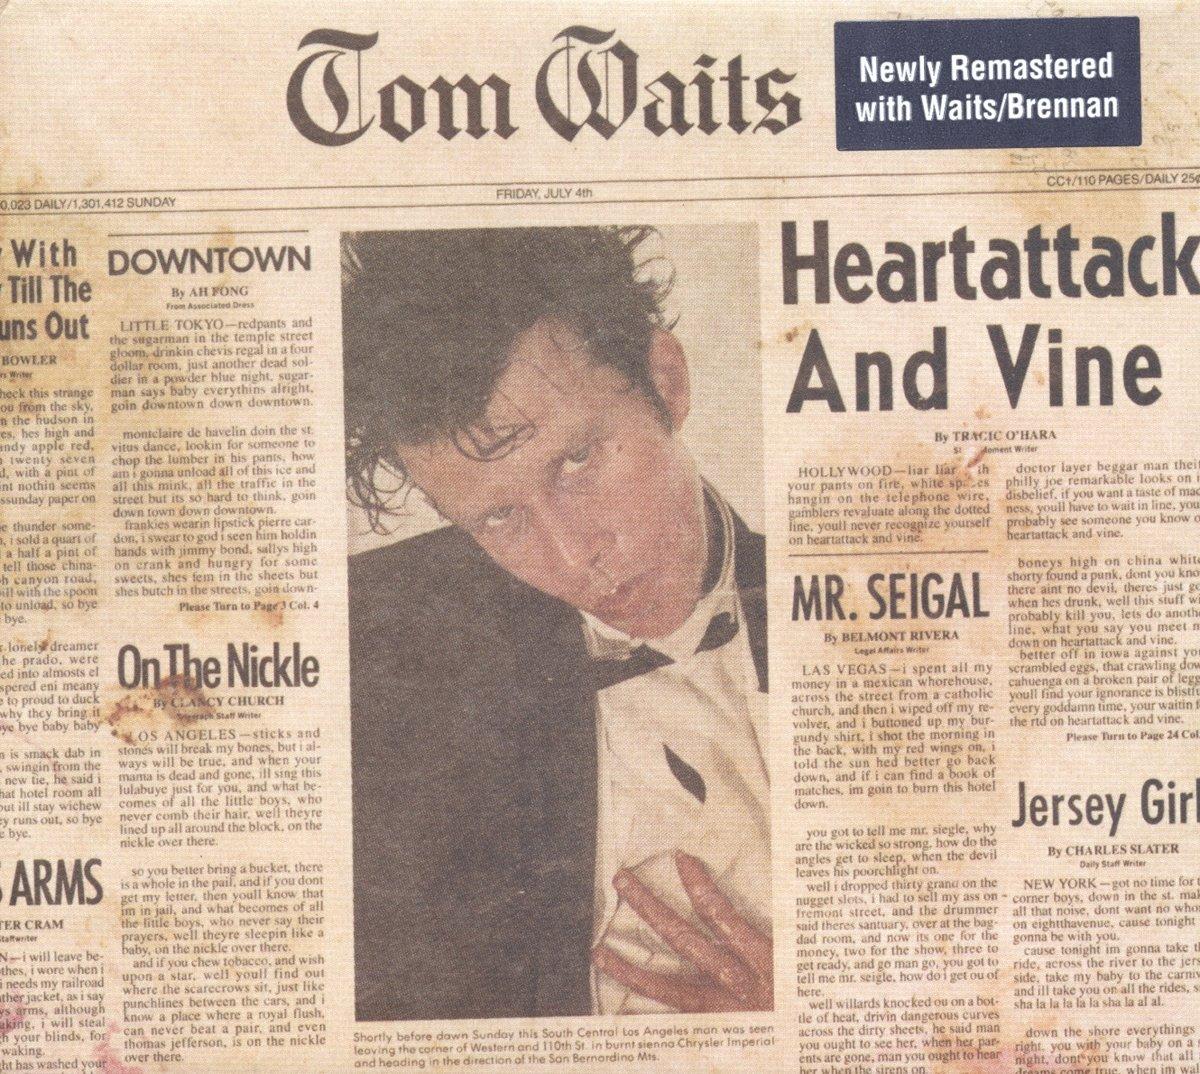 Tom Waits - Heartattack and Vine (Remastered)